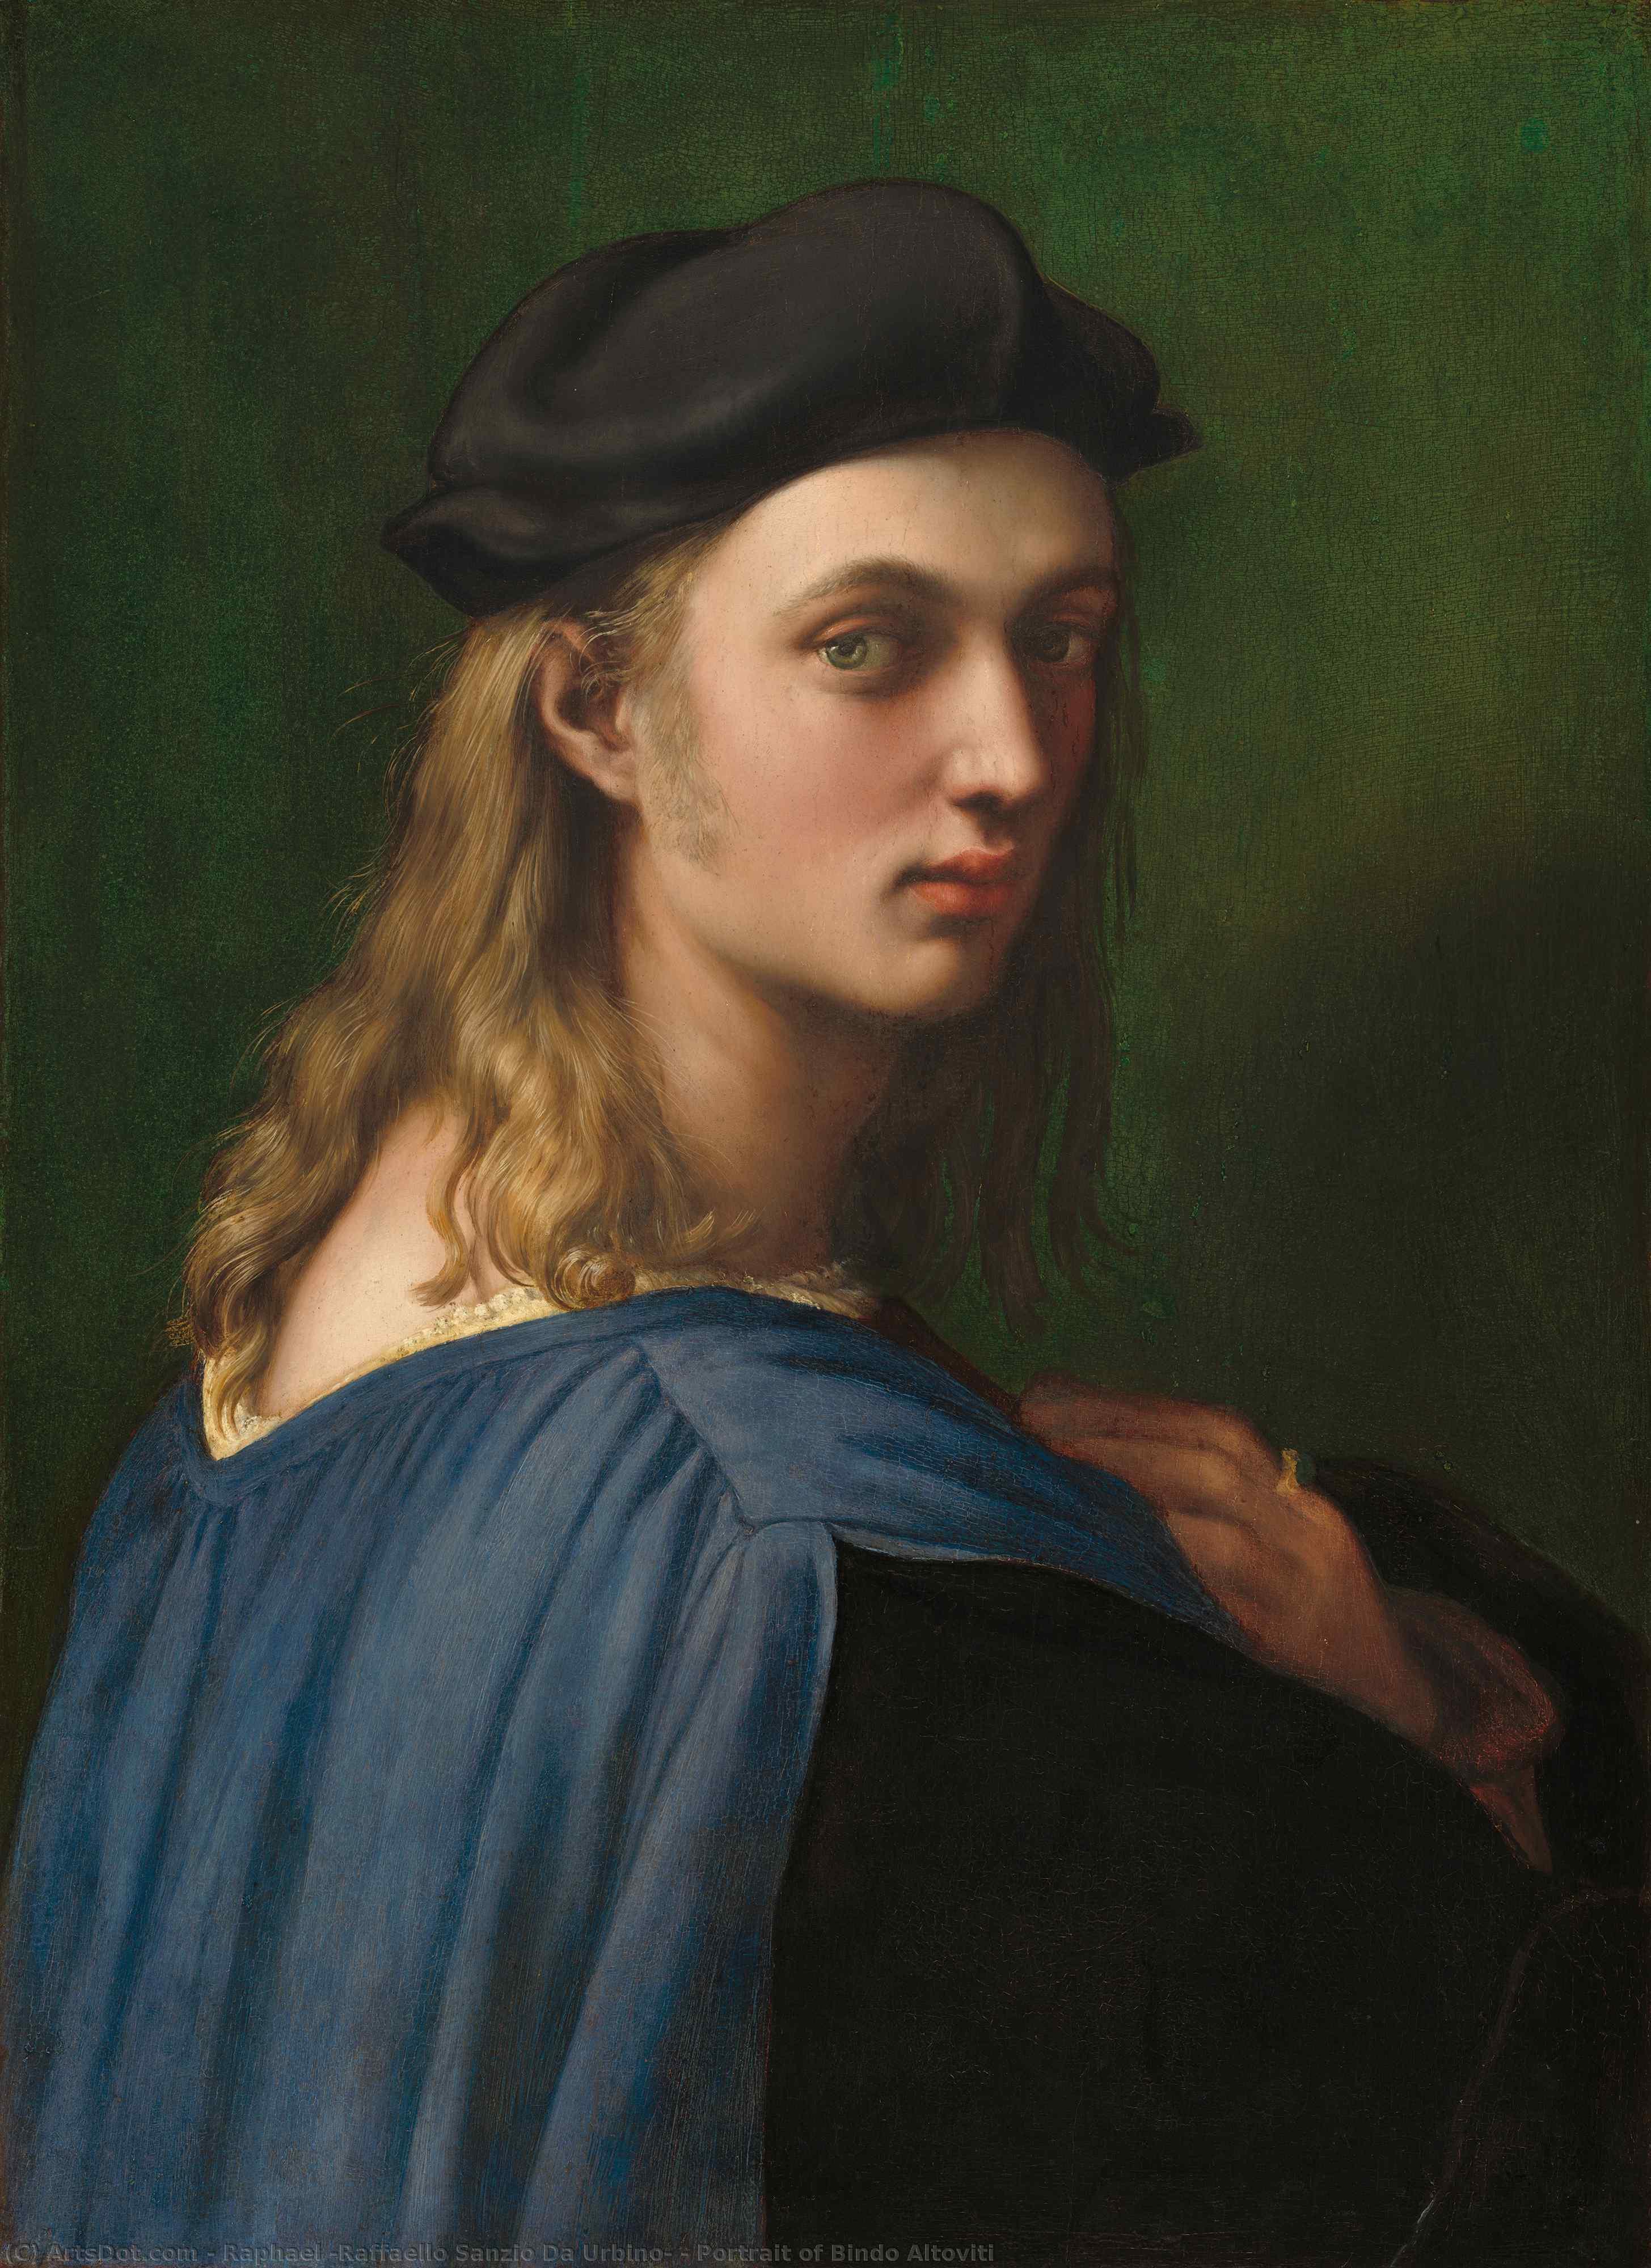 WikiOO.org - אנציקלופדיה לאמנויות יפות - ציור, יצירות אמנות Raphael (Raffaello Sanzio Da Urbino) - Portrait of Bindo Altoviti